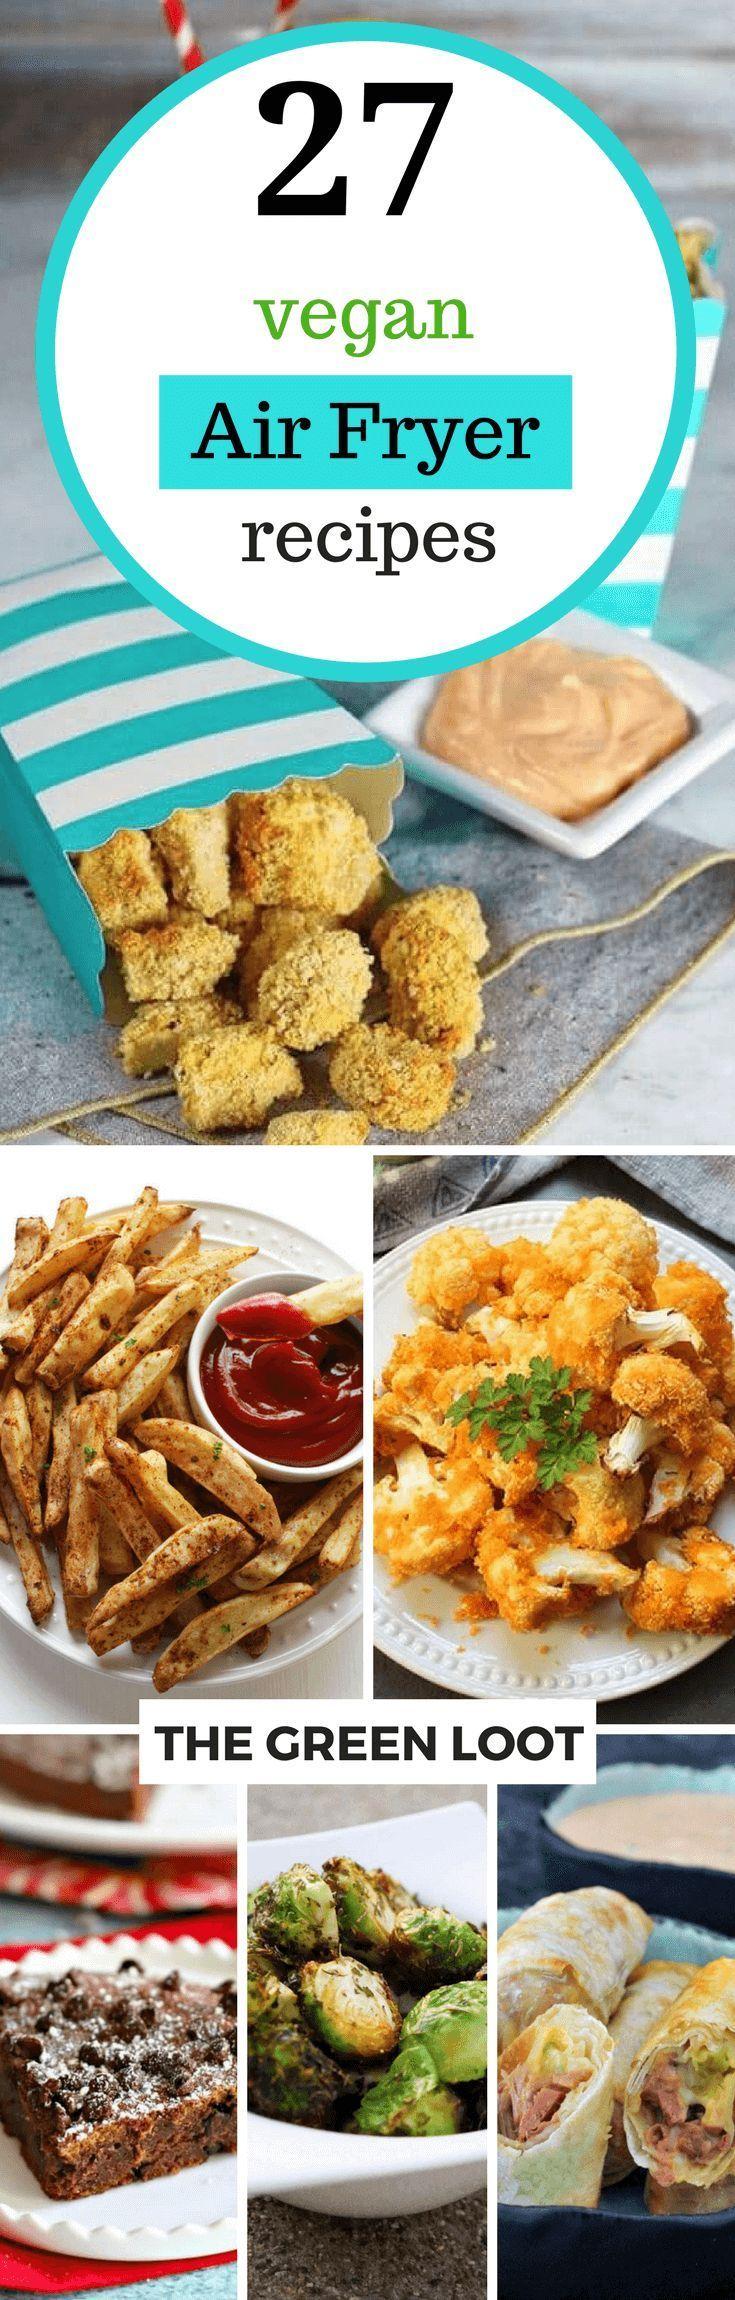 27 Super Tasty Vegan Air Fryer Recipes (Healthy) Air